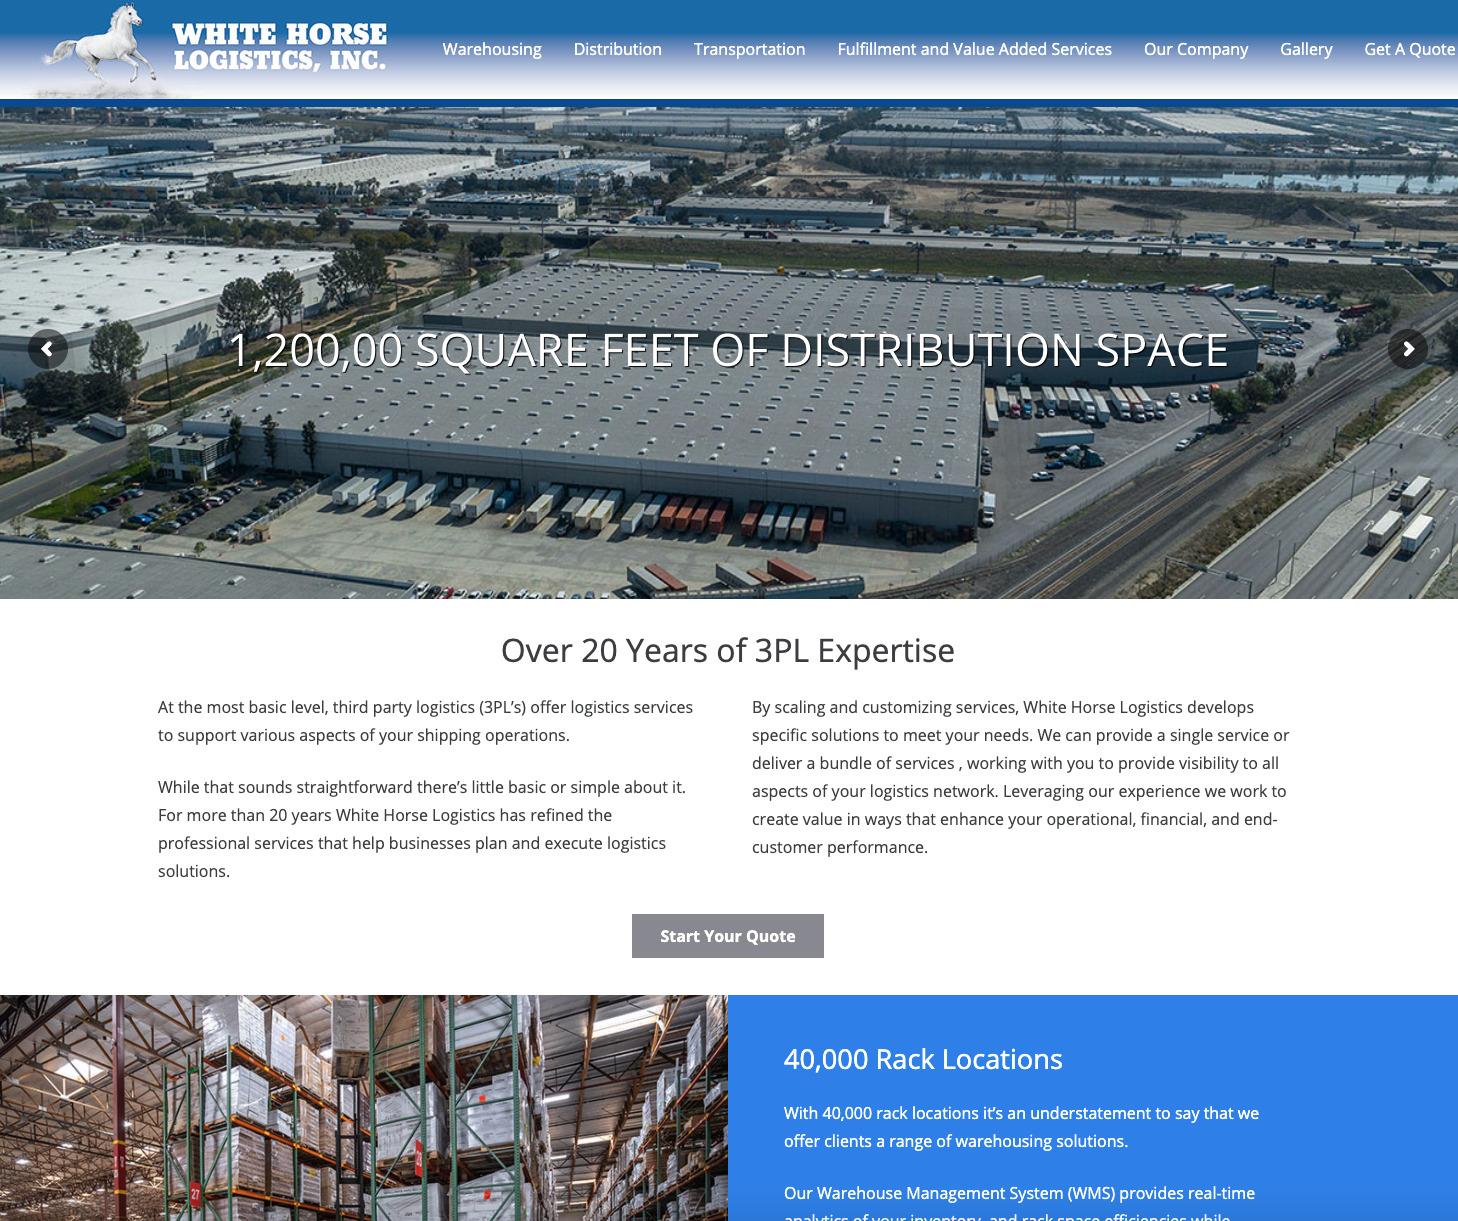 White Horse Logistics Warehouse Distribution Transportation